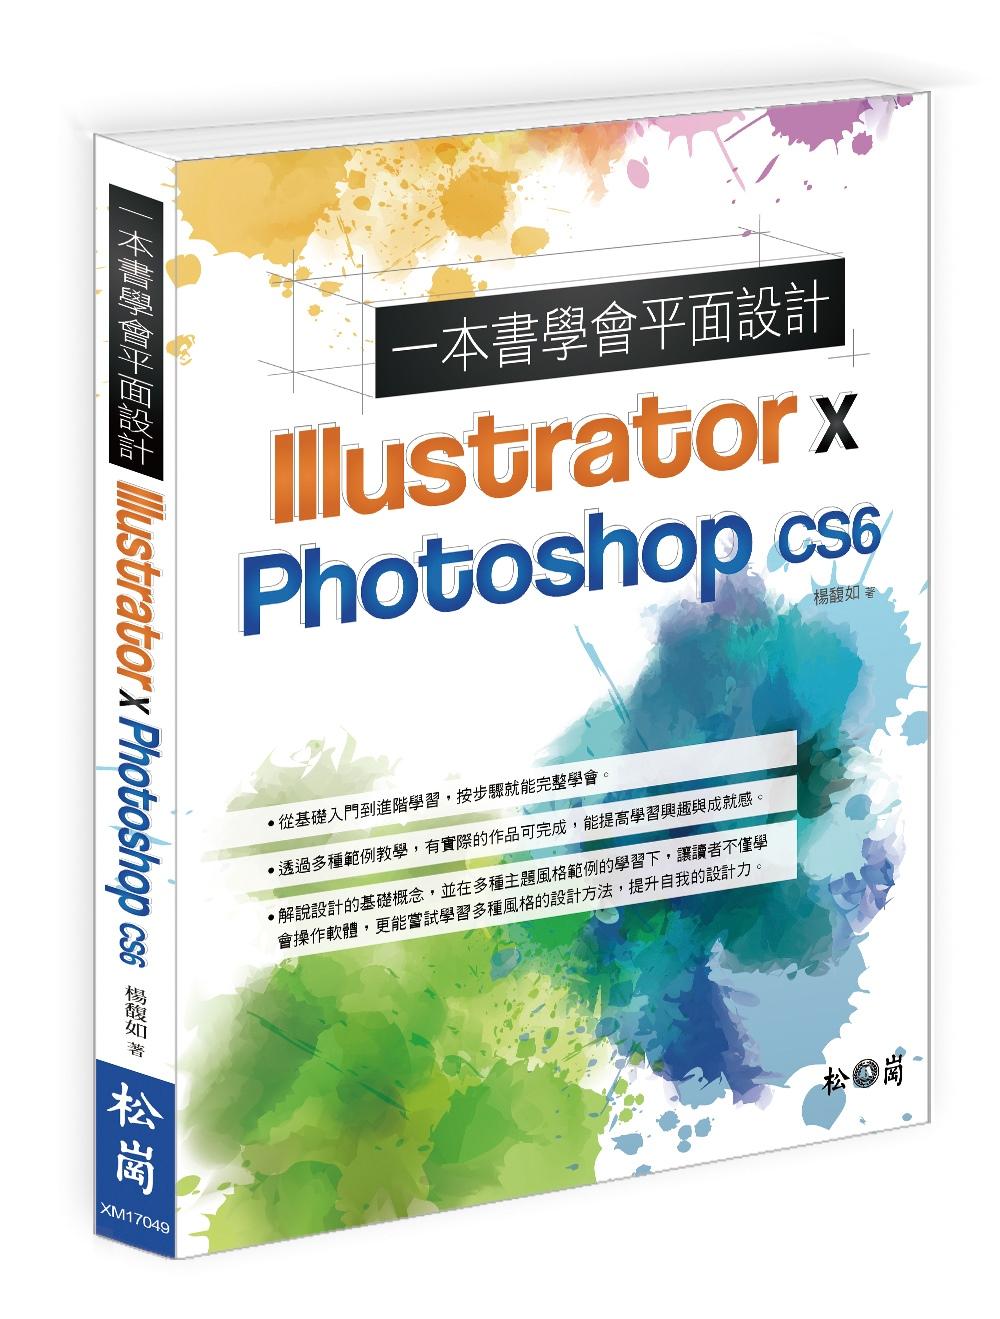 一本書學會平面設計Illustrator & Photoshop CS6(附DVD)